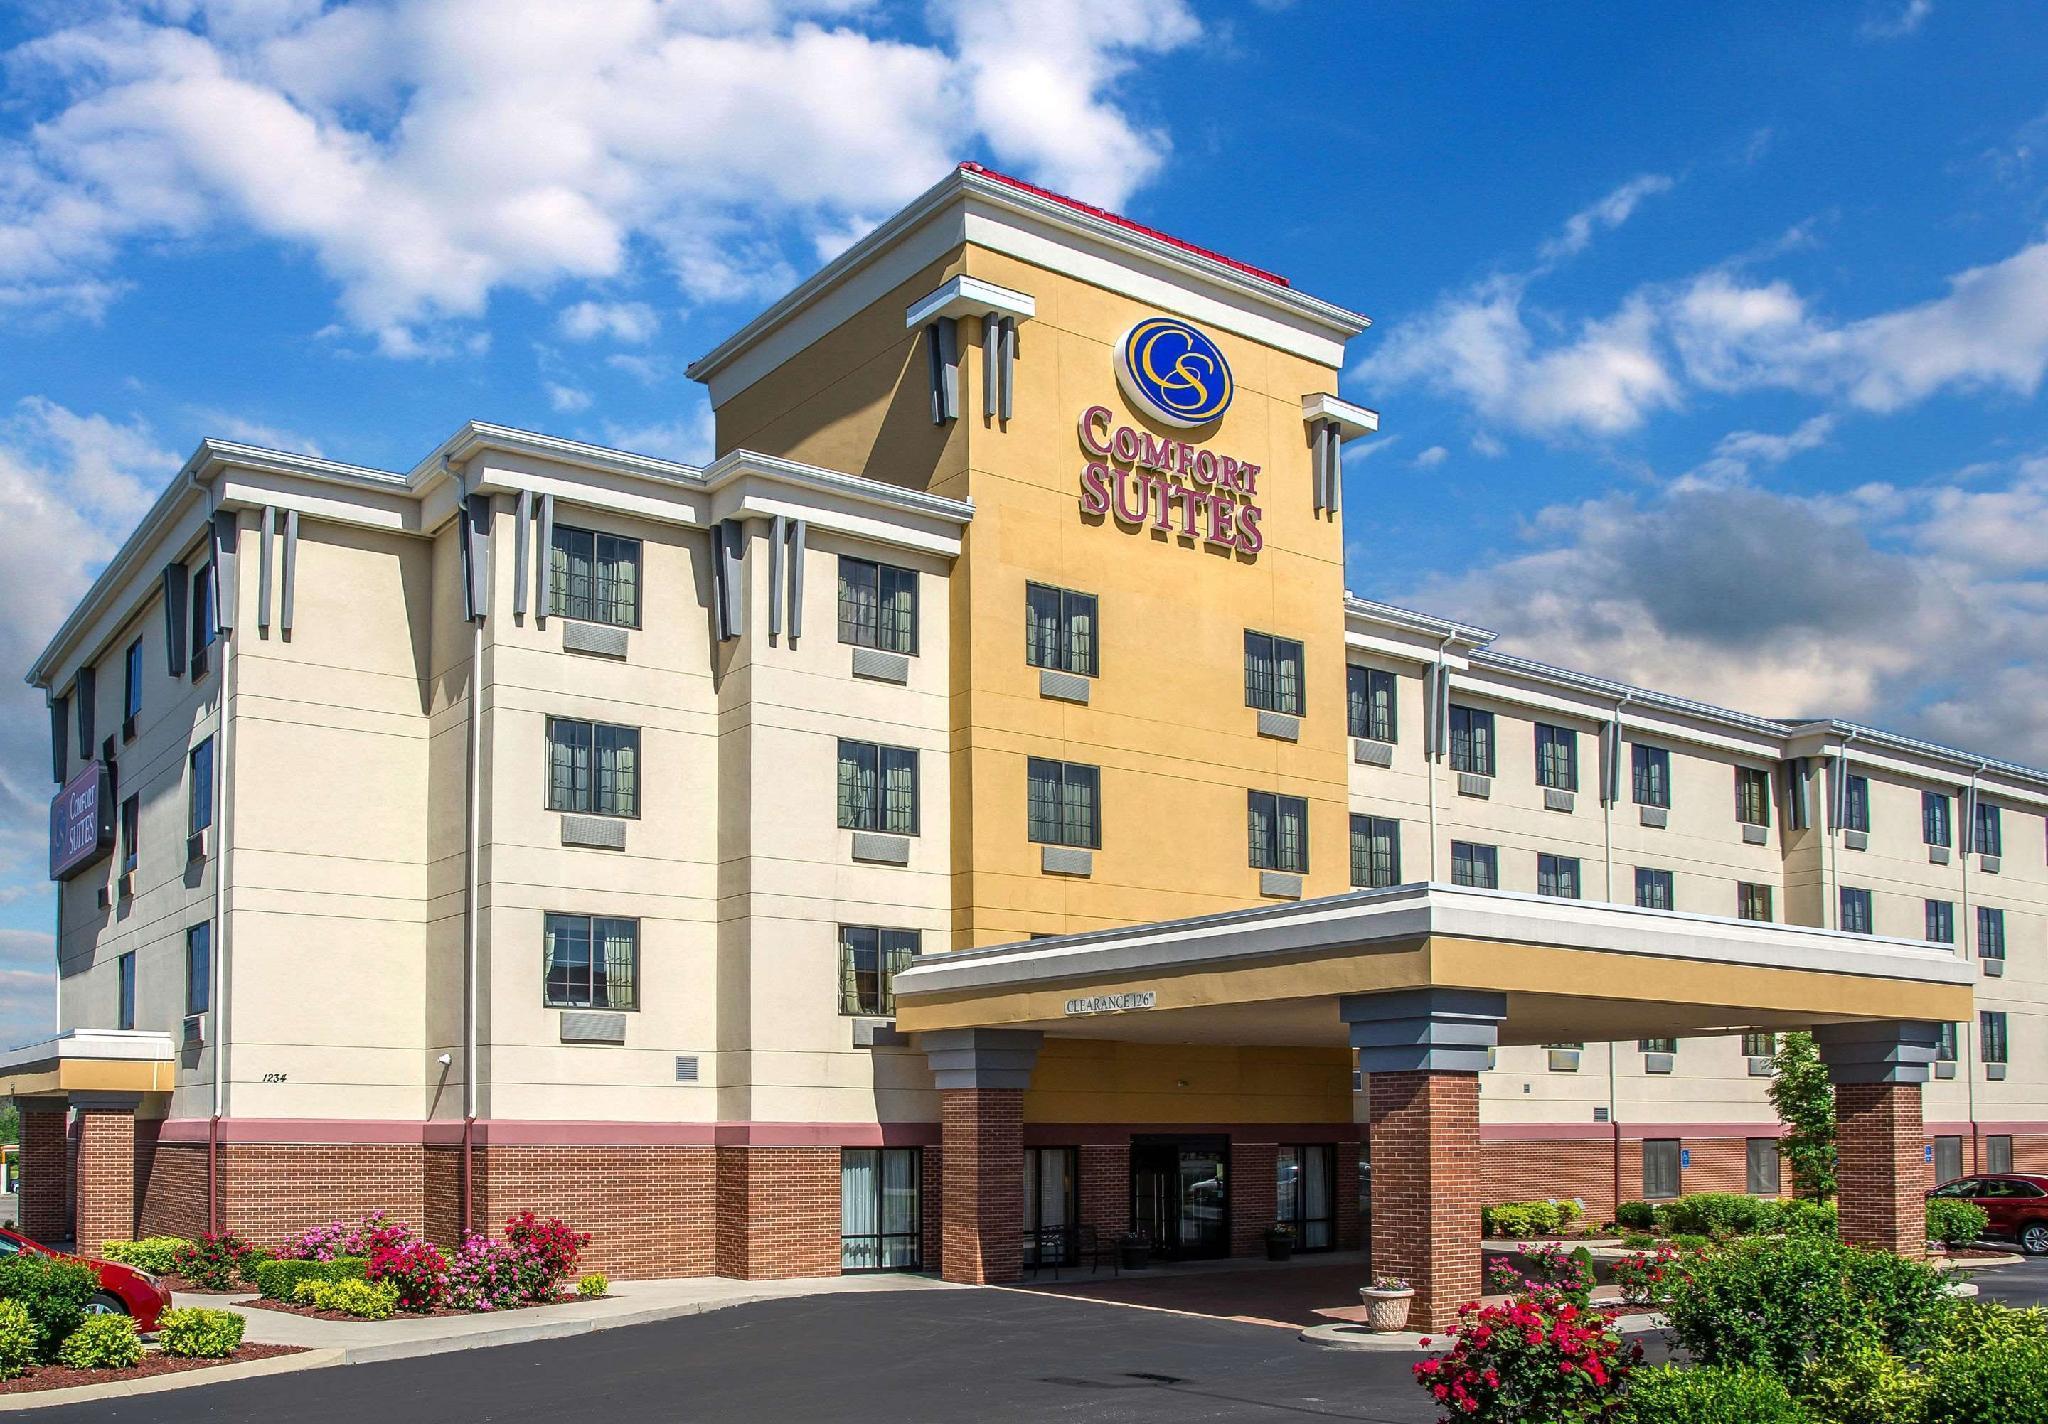 Comfort Suites Cincinnati